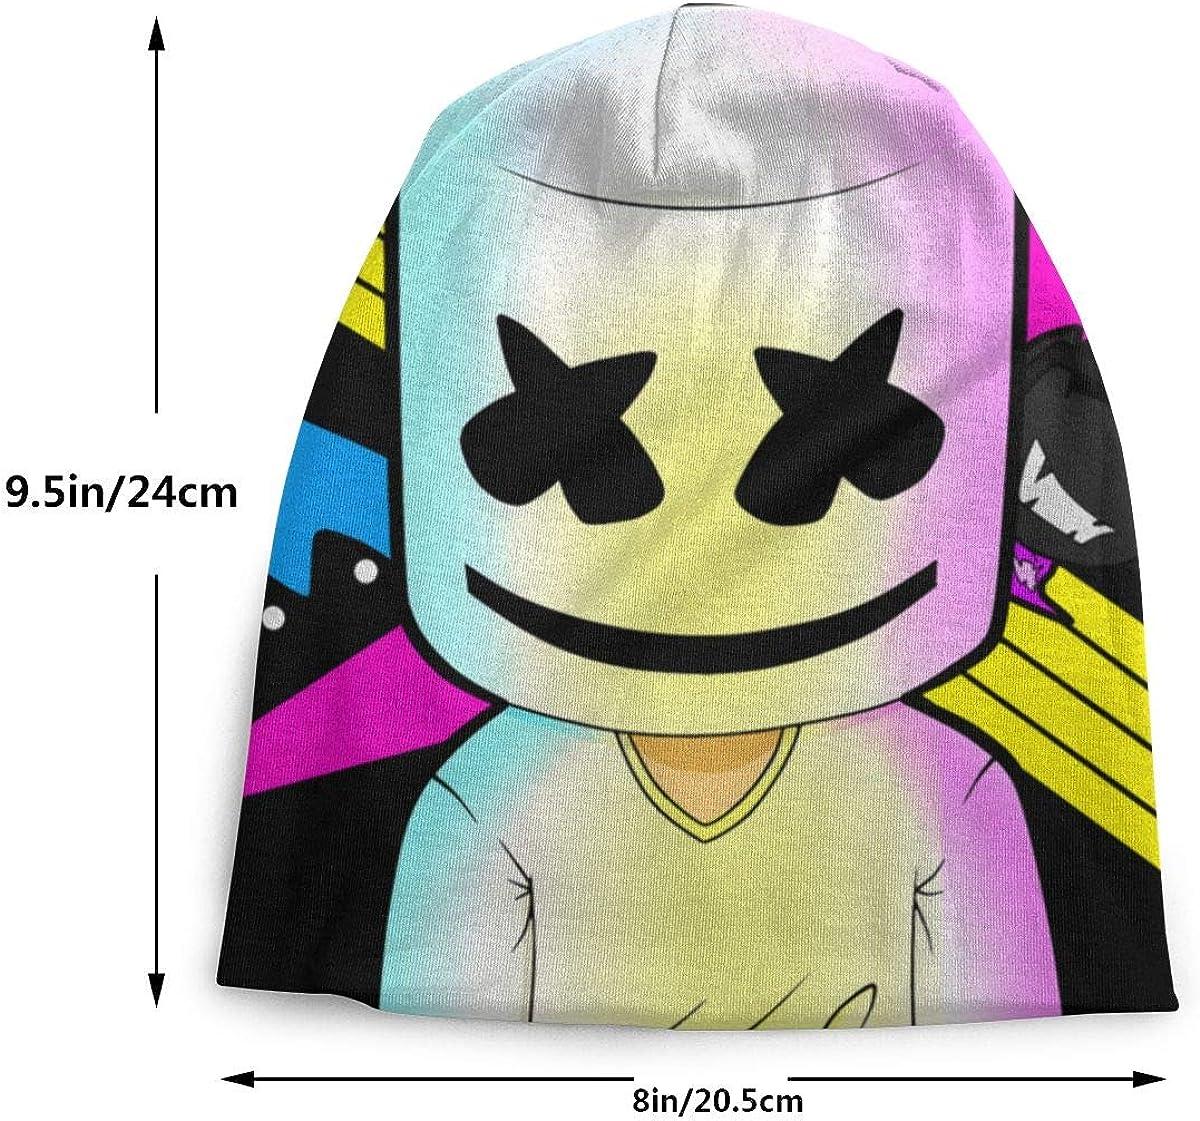 TROVL Marshmellow DJ-Smile Skullies Beanies Casual Bonnet Cap for Boys Girls 3-15 Years Kids